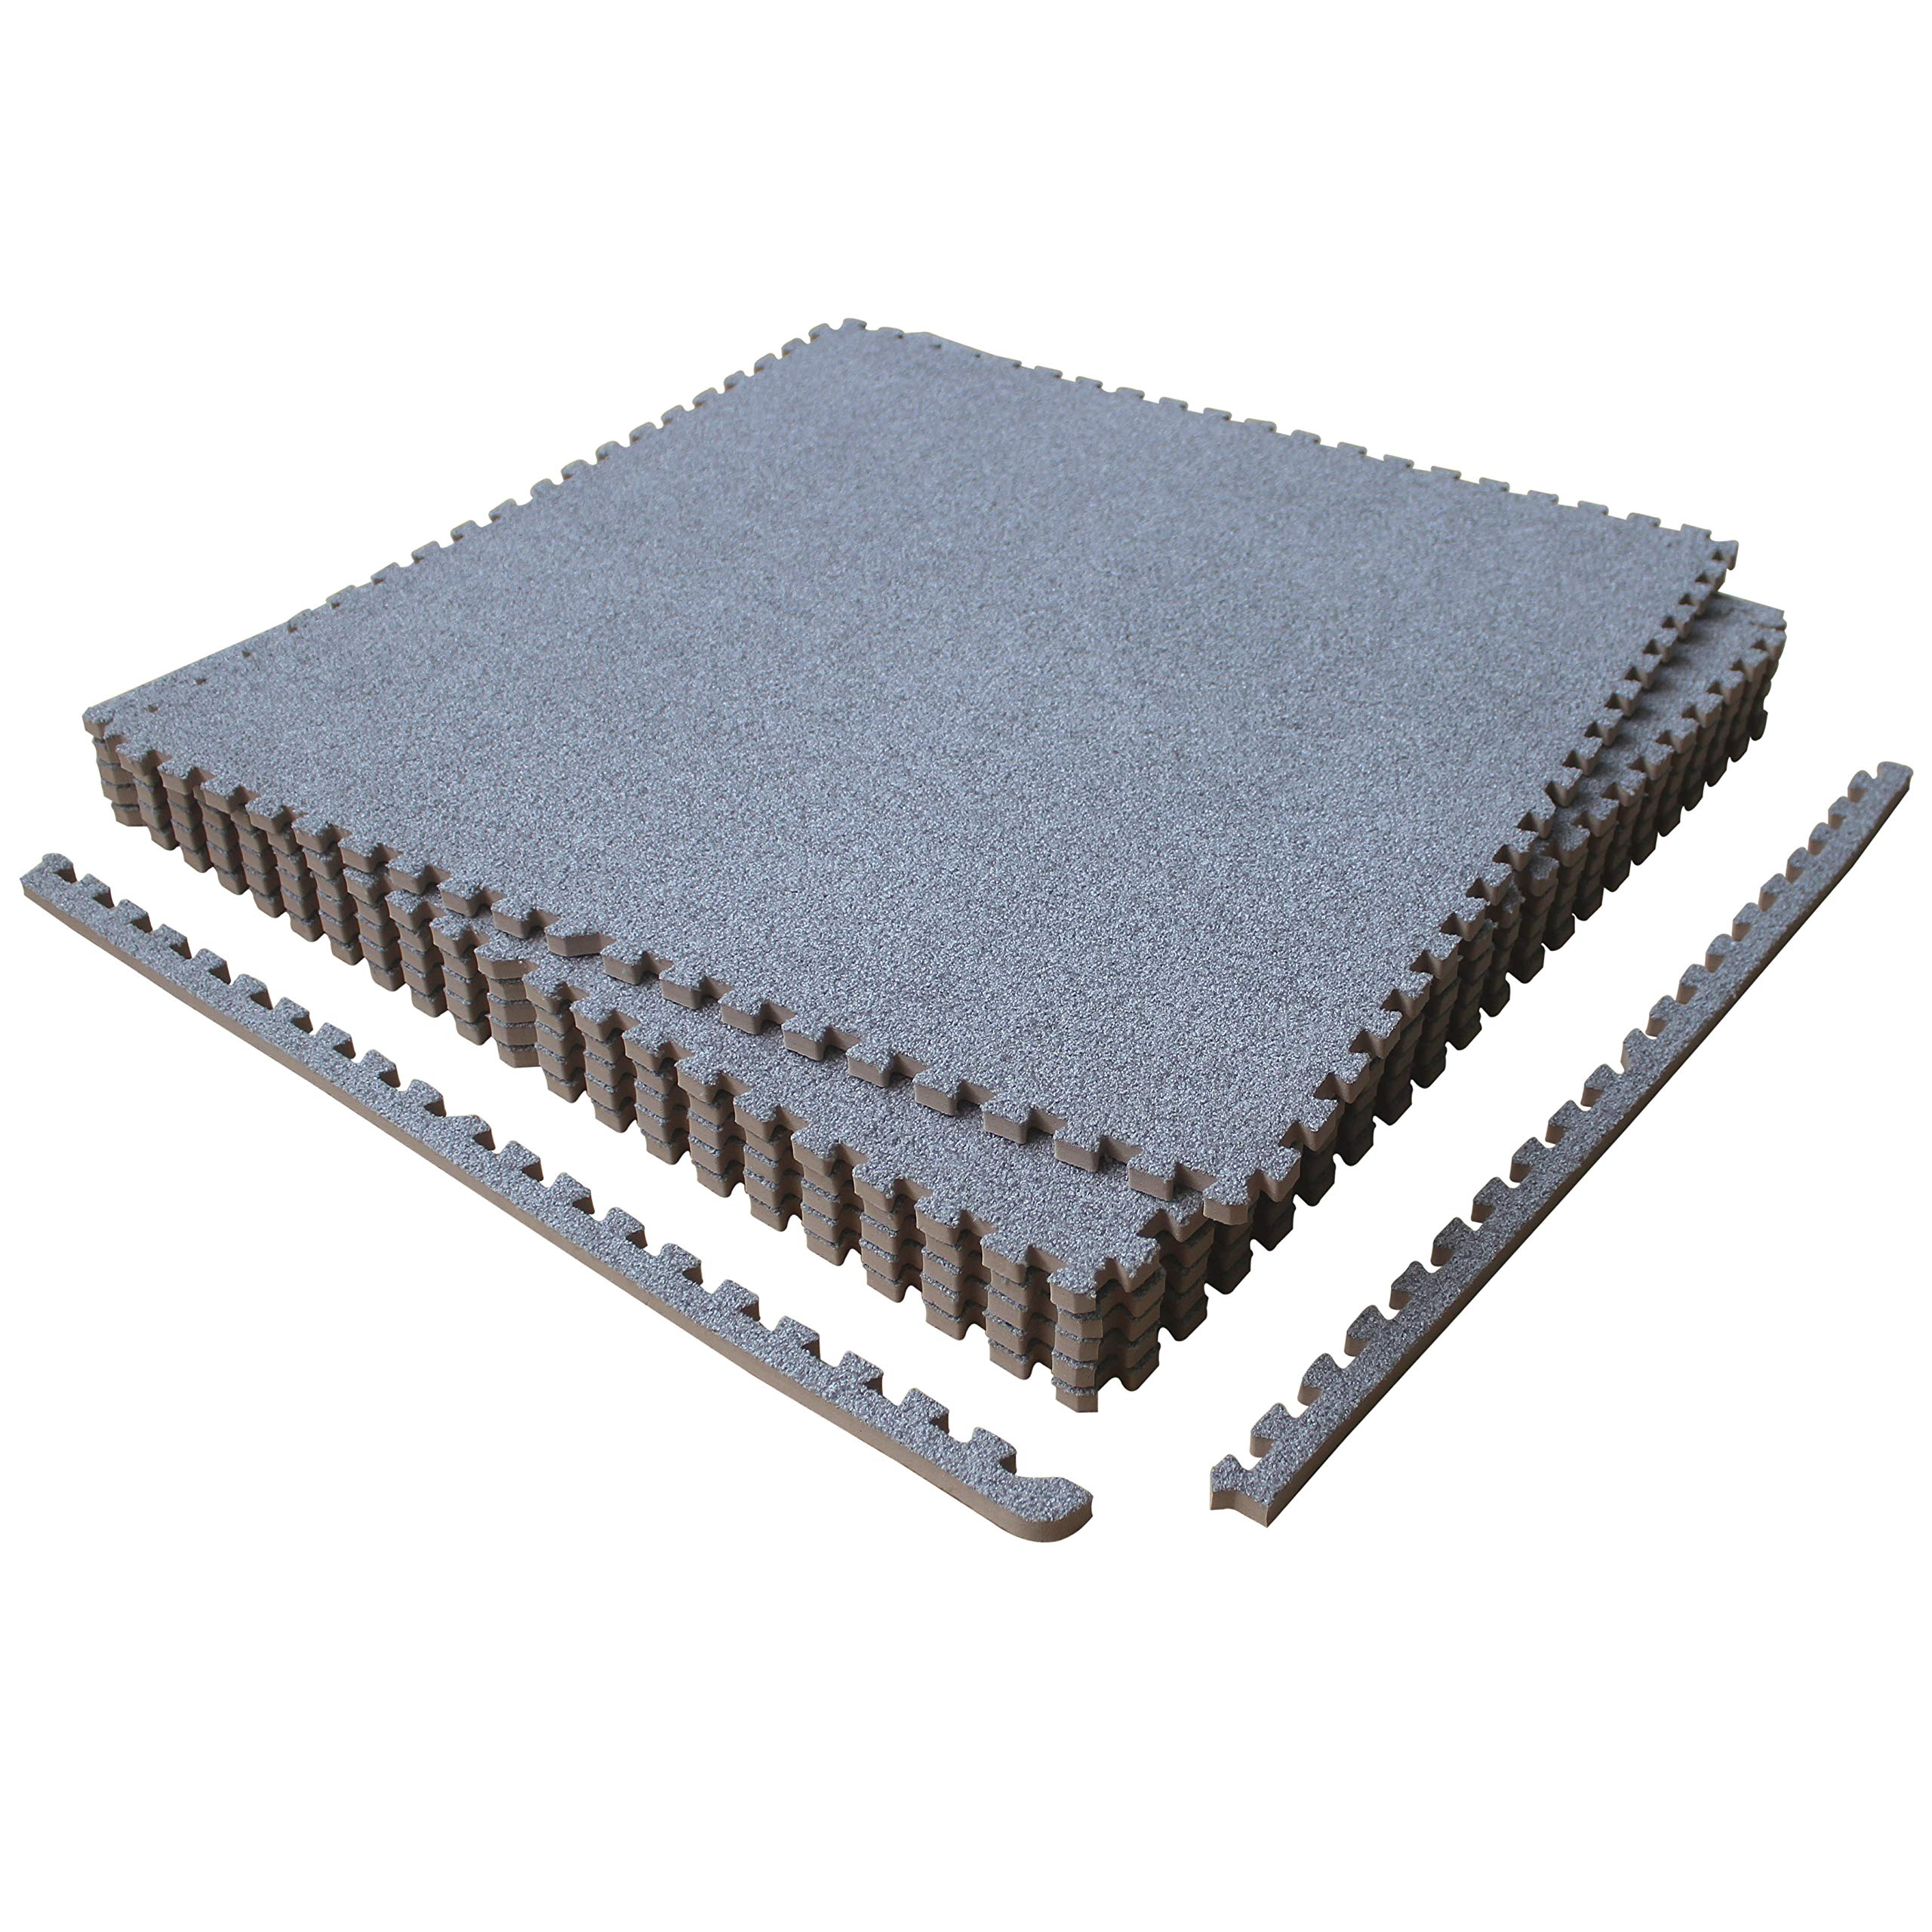 LaFamille Interlocking Foam Floor Mat 6 Tiles 24 sq.ft Puzzle Carpet Flooring Exercise Square Mats Gym,Playroom Floor Mats for Carpet 2'x2' (Light Grey)